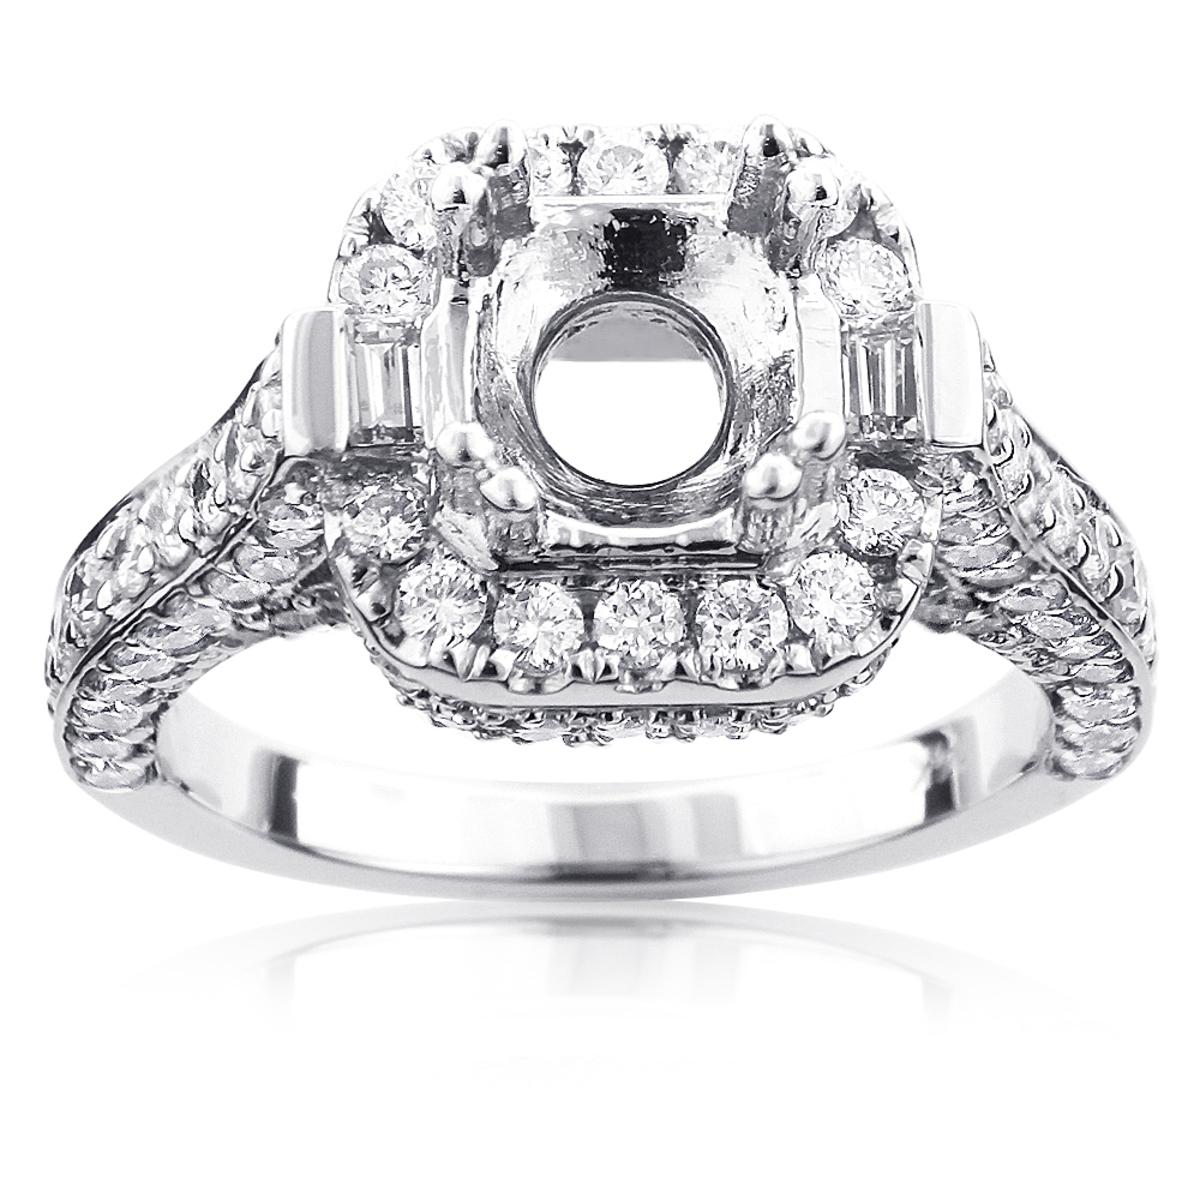 14K Gold Diamond Engagement Ring Setting 1.75ct Halo Semi Mounting